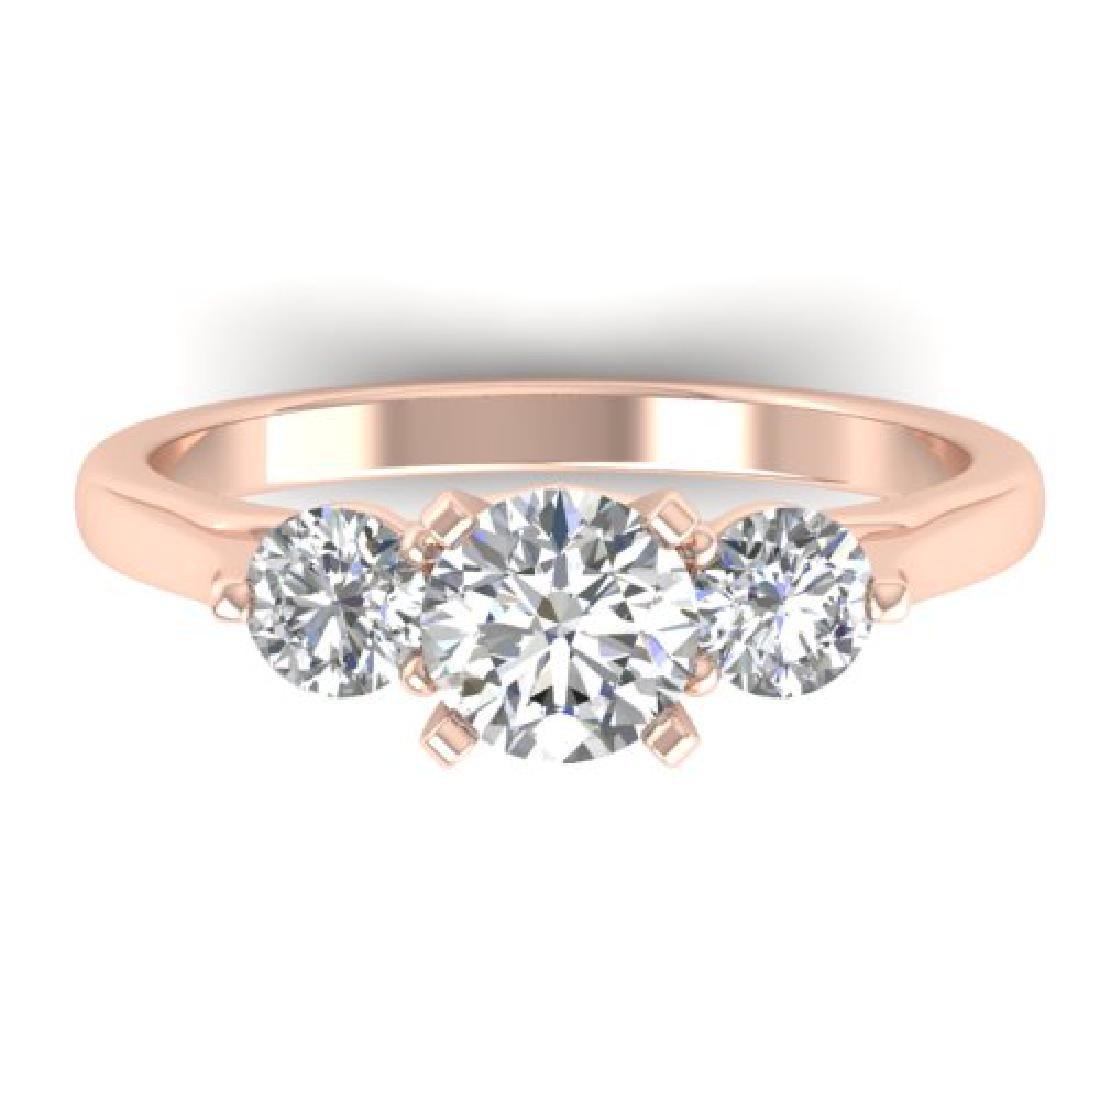 1.37 CTW Certified VS/SI Diamond Art Deco 3 Stone Ring